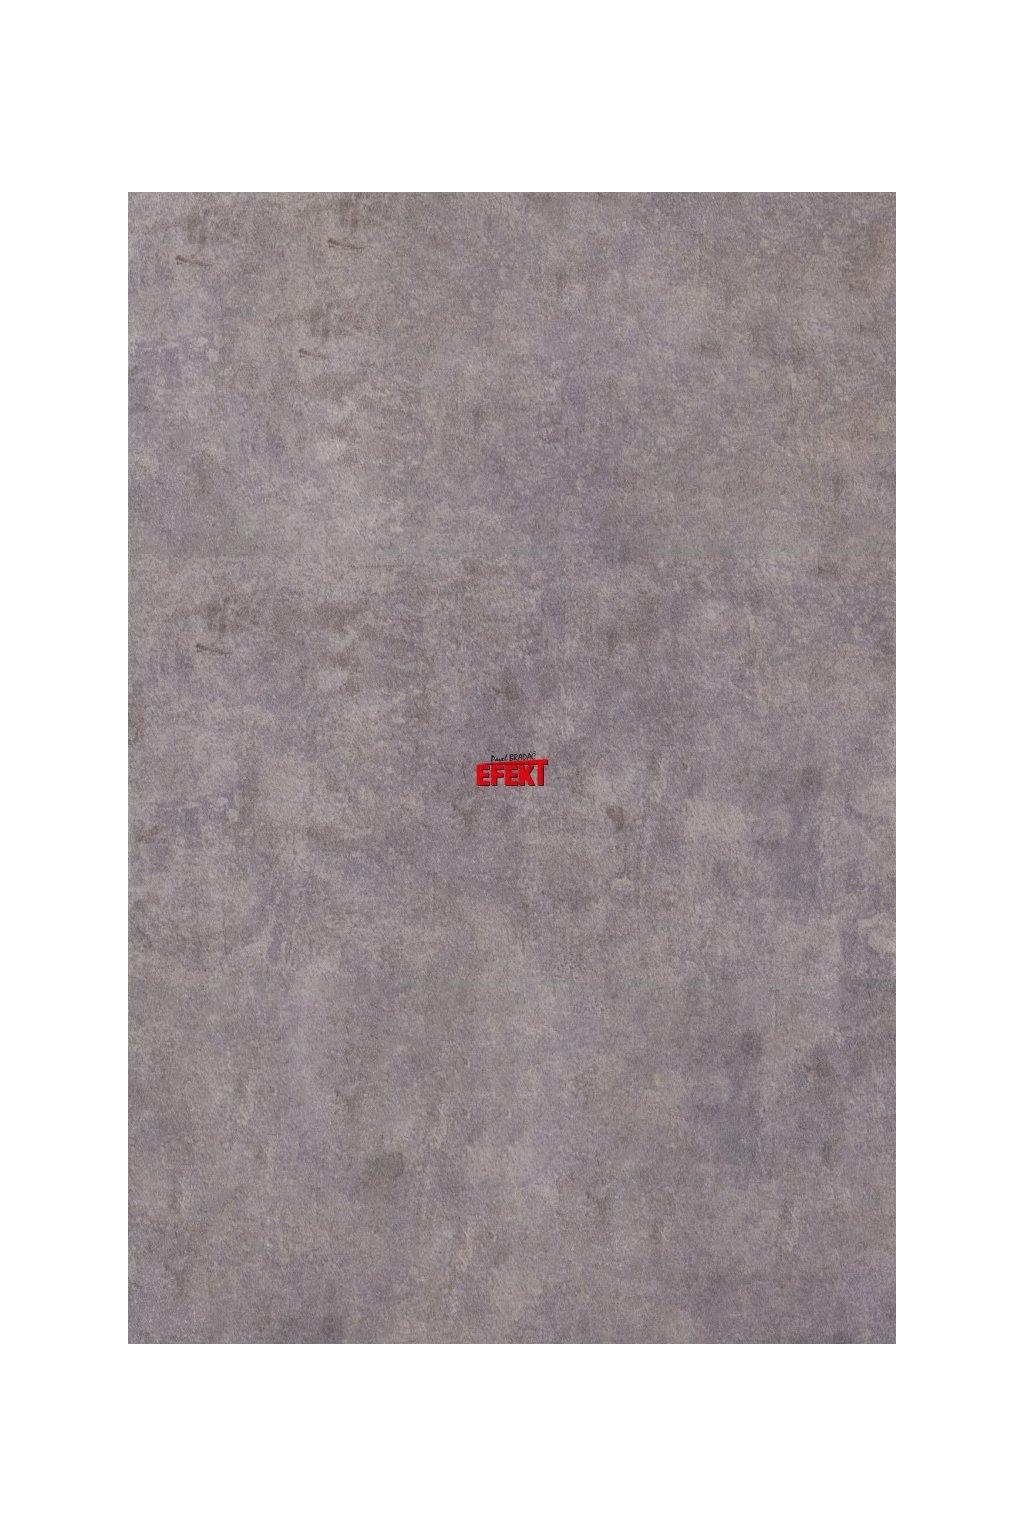 Gerflor Taralay Initial Compact Strada Ciment 0465